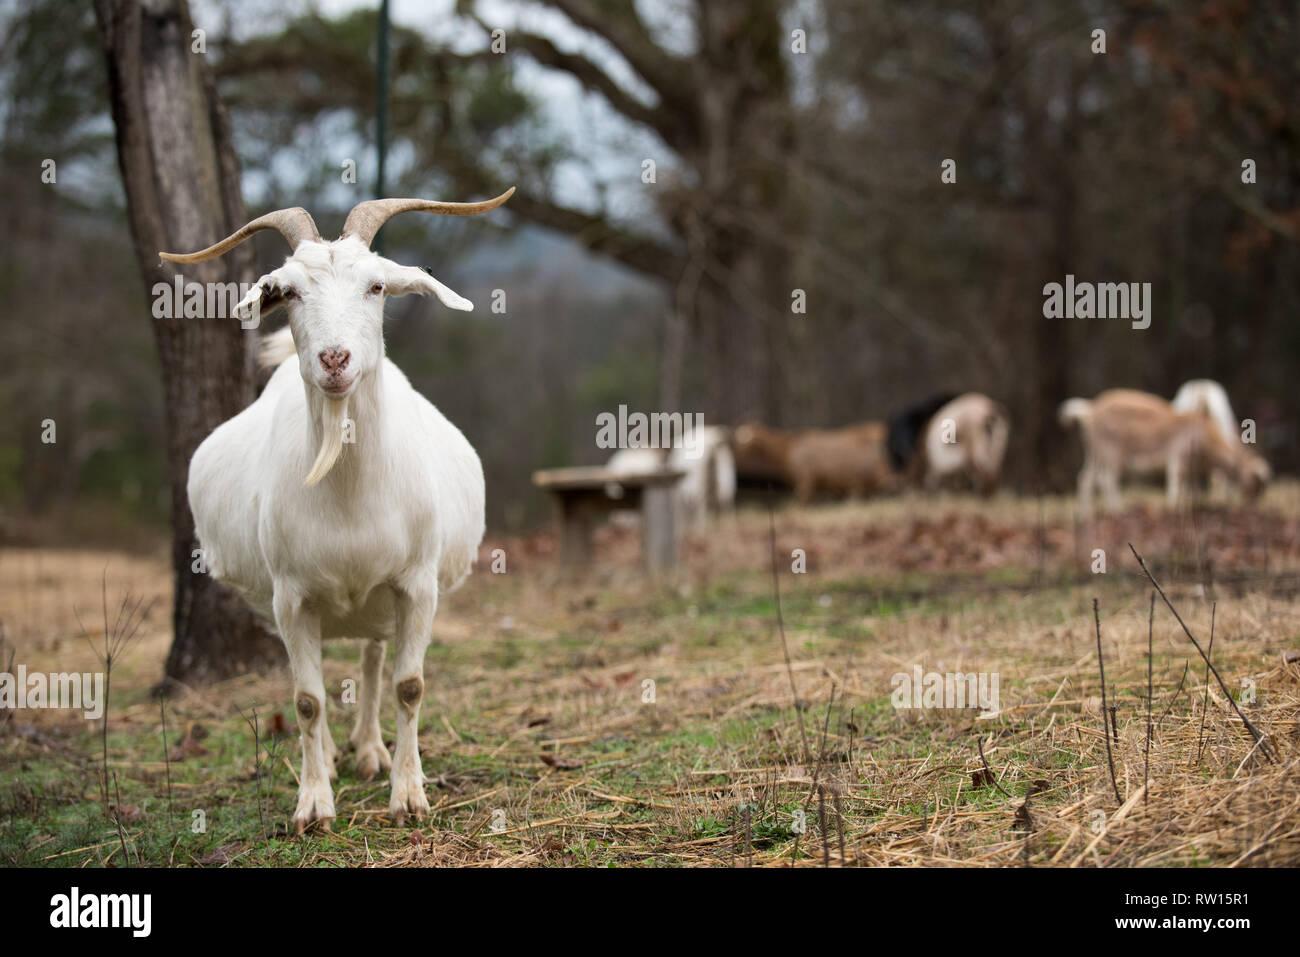 Pregnant Goat Stock Photos Pregnant Goat Stock Images Alamy